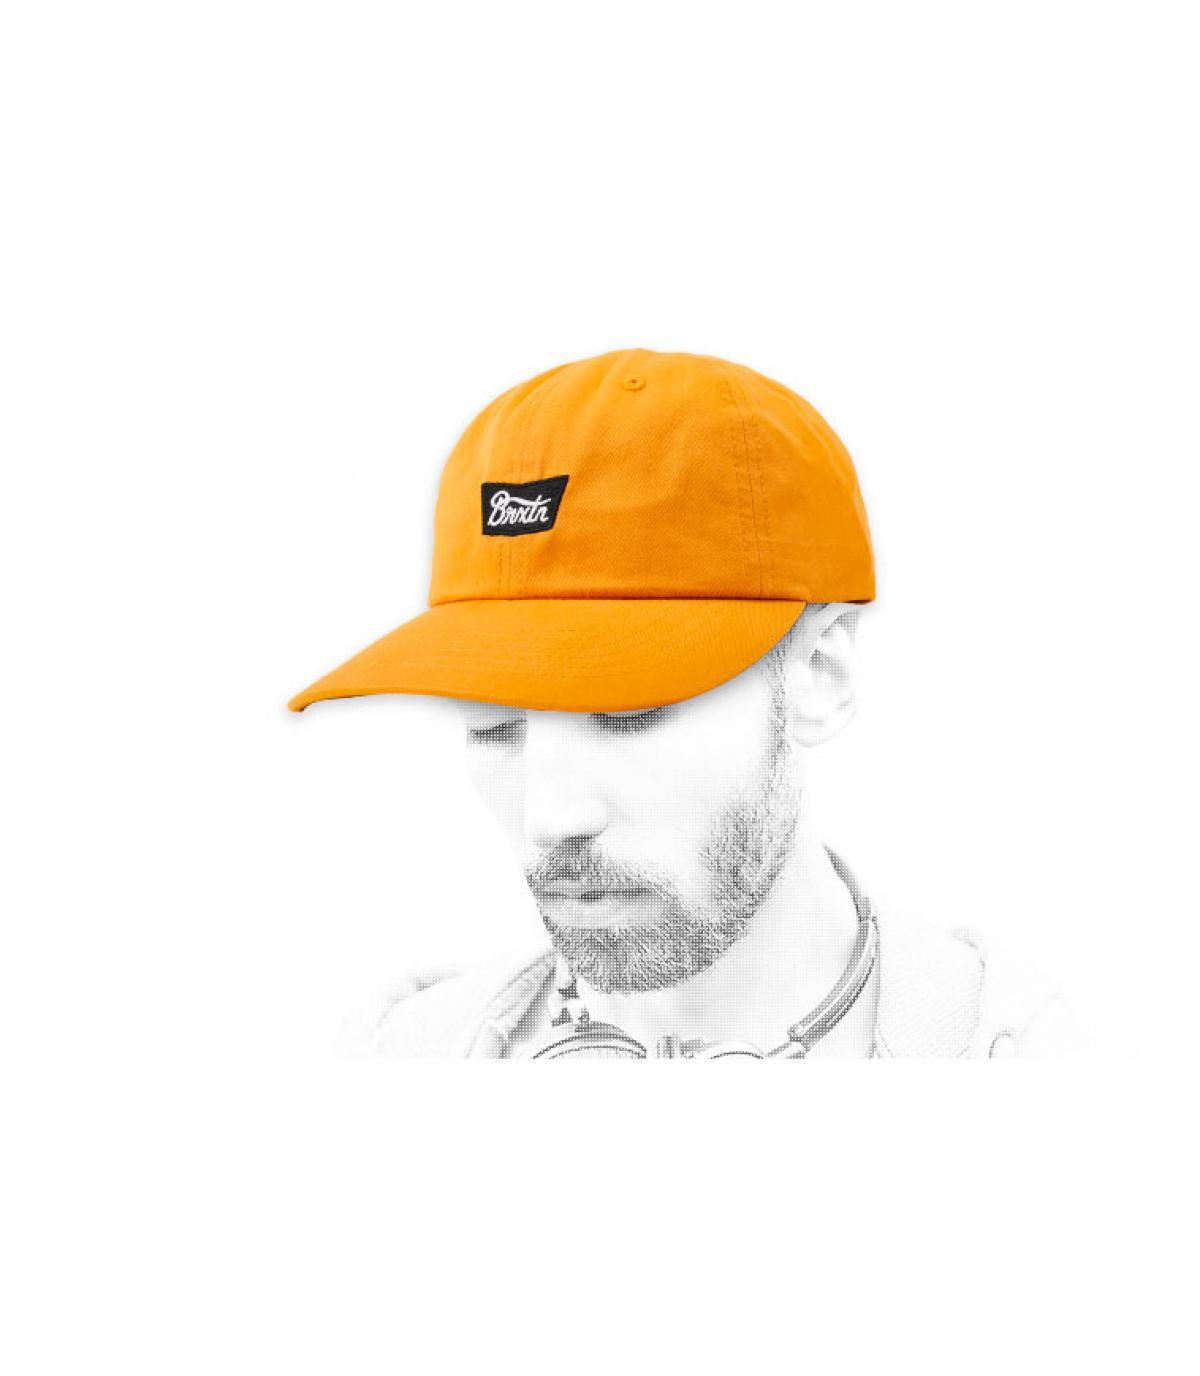 mustard yellow cap